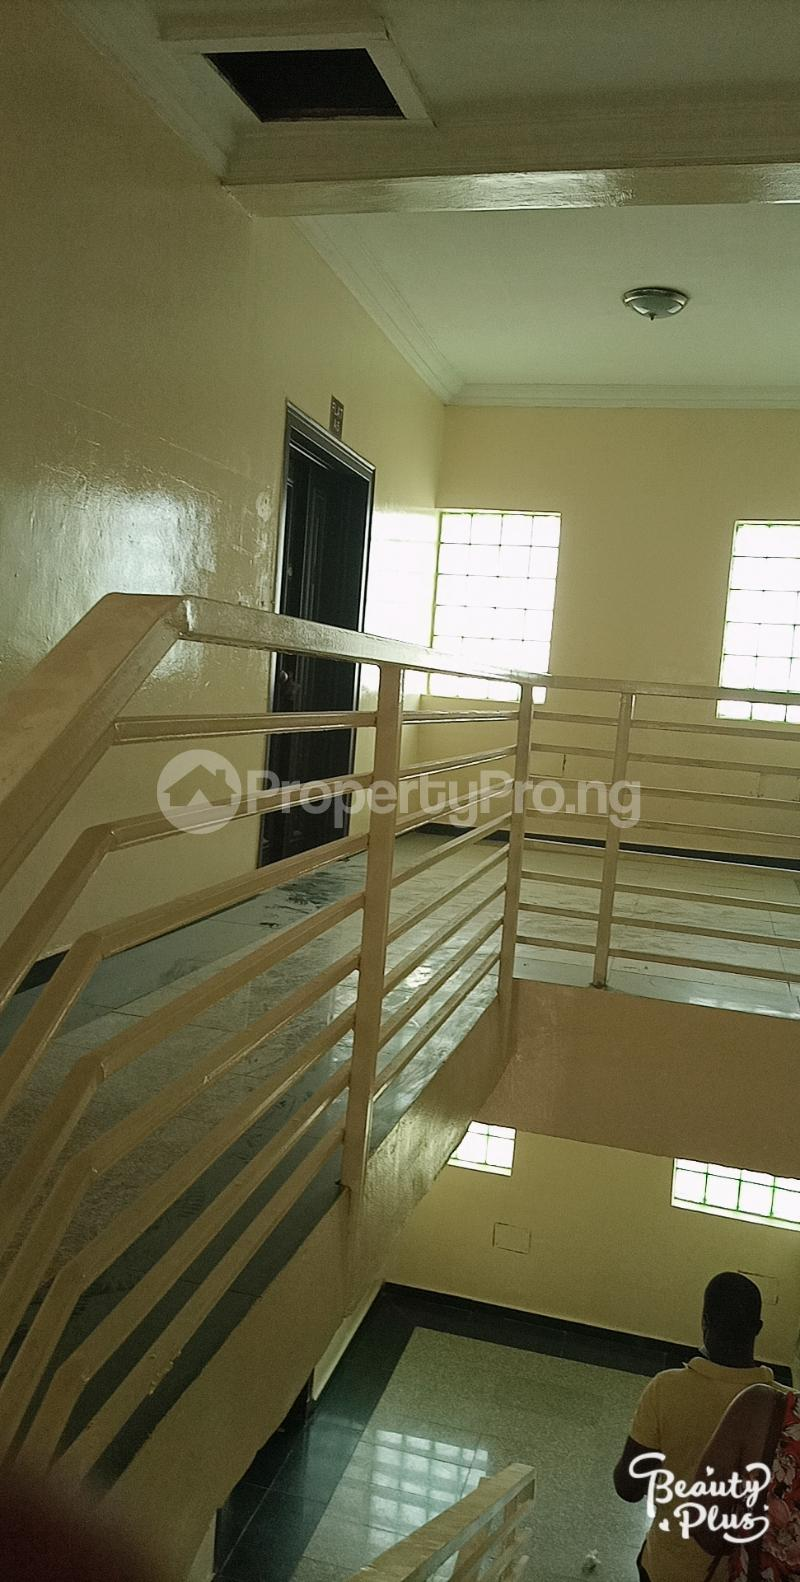 3 bedroom Flat / Apartment for rent Oke Afa isolo. Lagos Mainland Oke-Afa Isolo Lagos - 3